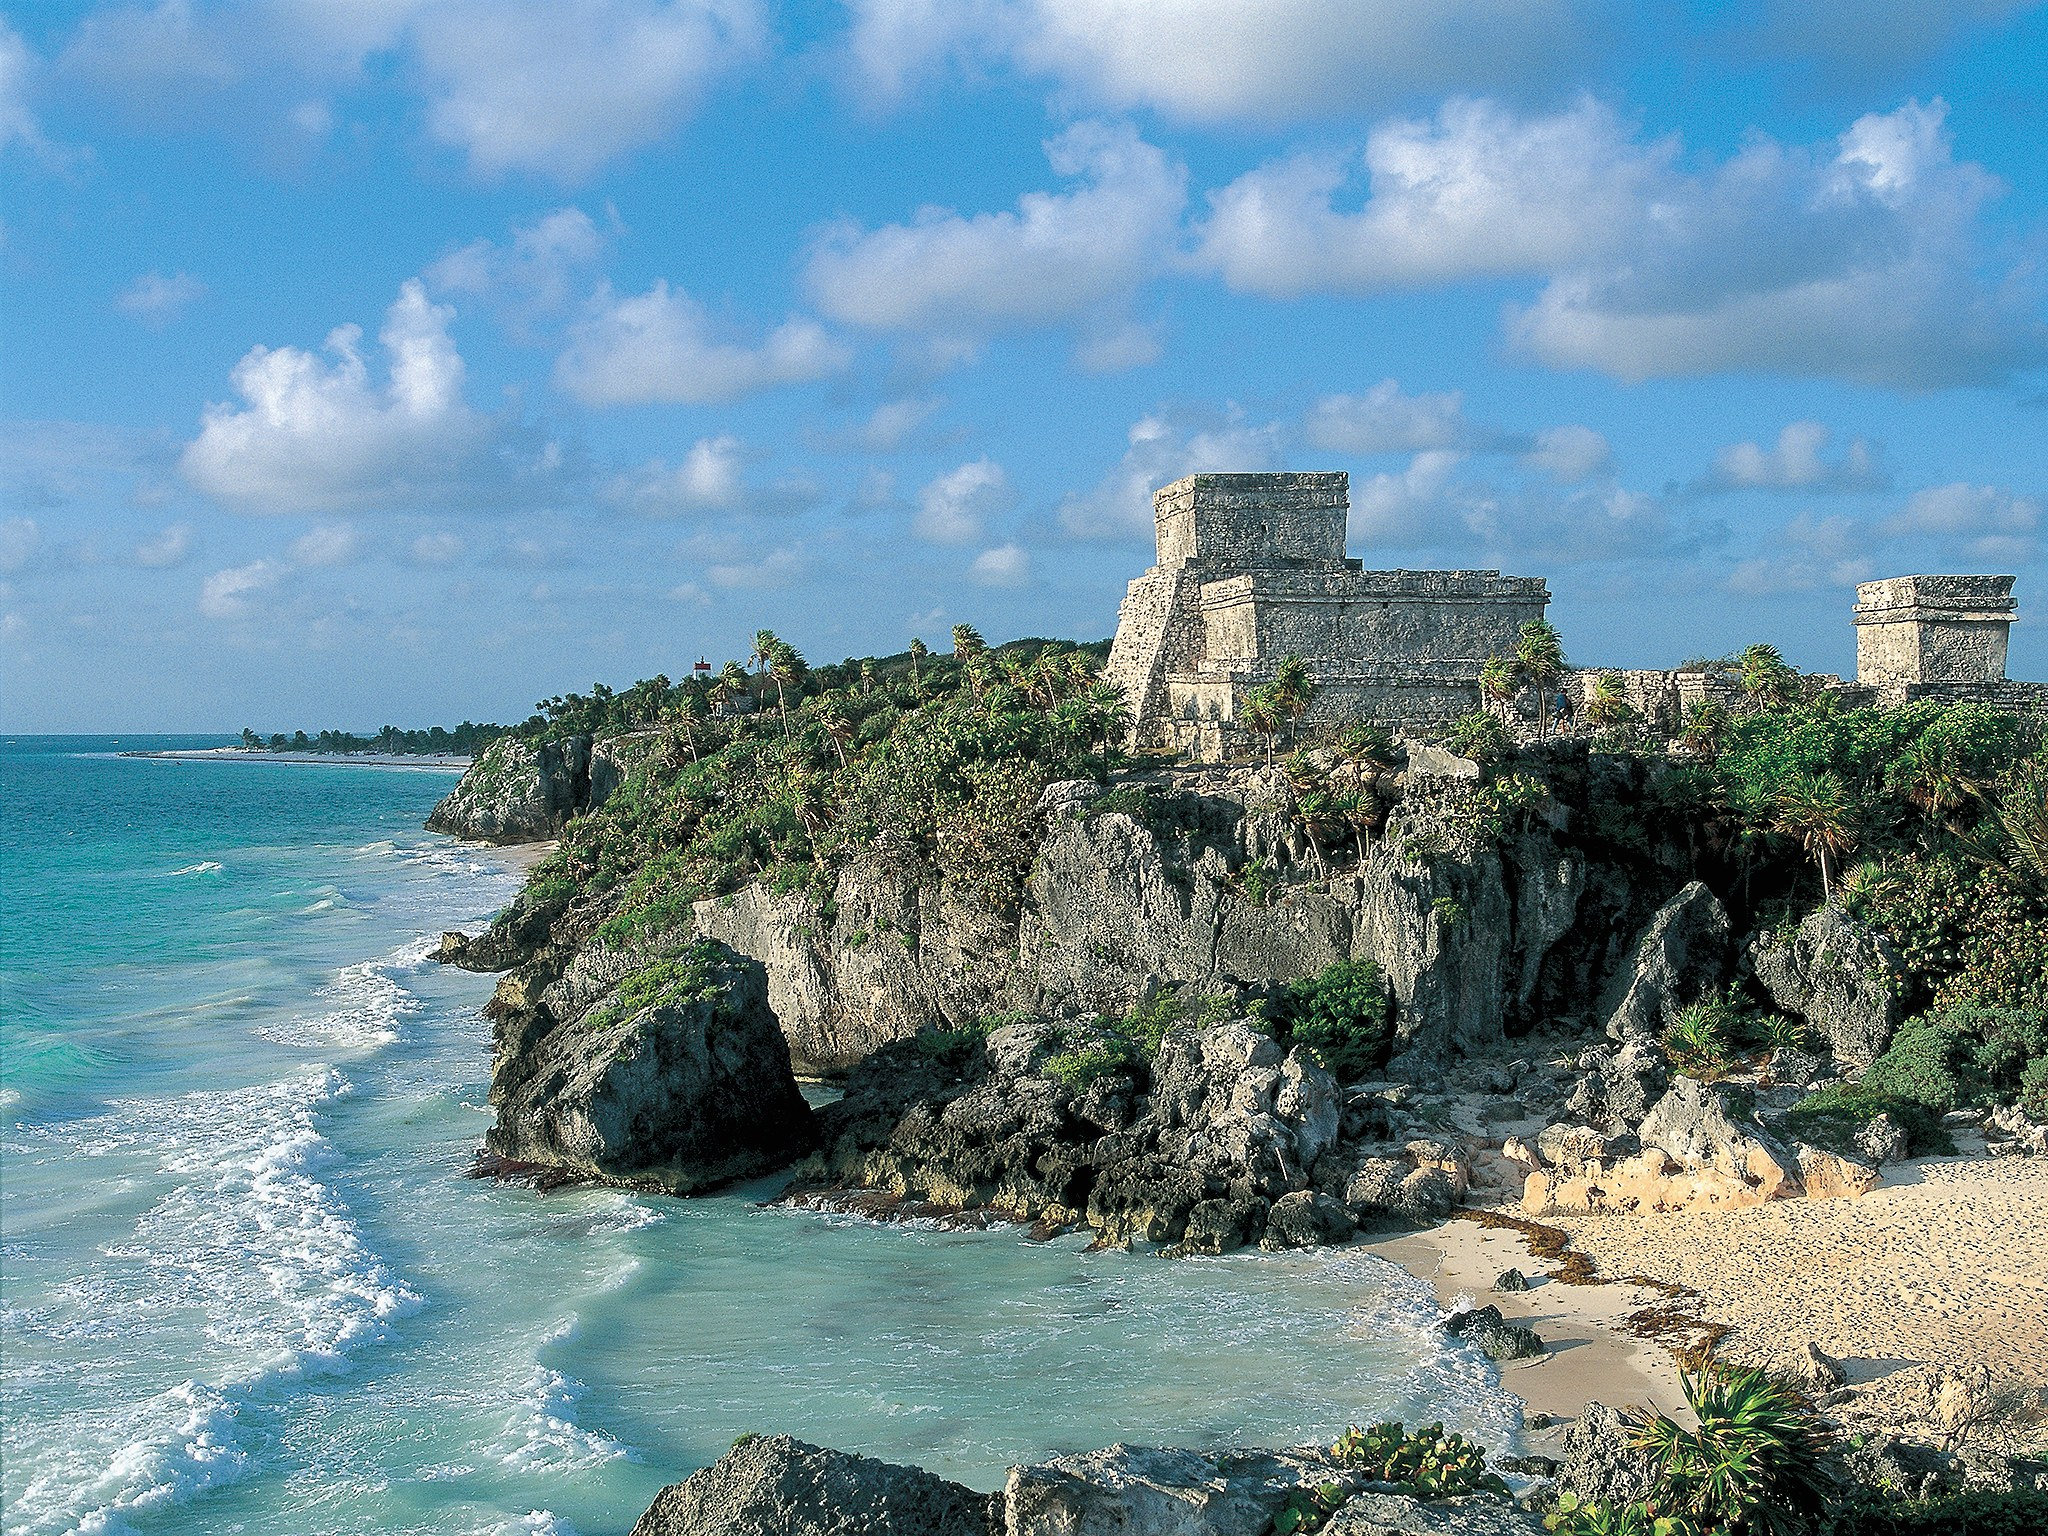 travel-wishlist-el-castillo-quintana-roo-tulum-mexico-conde-nast-traveler